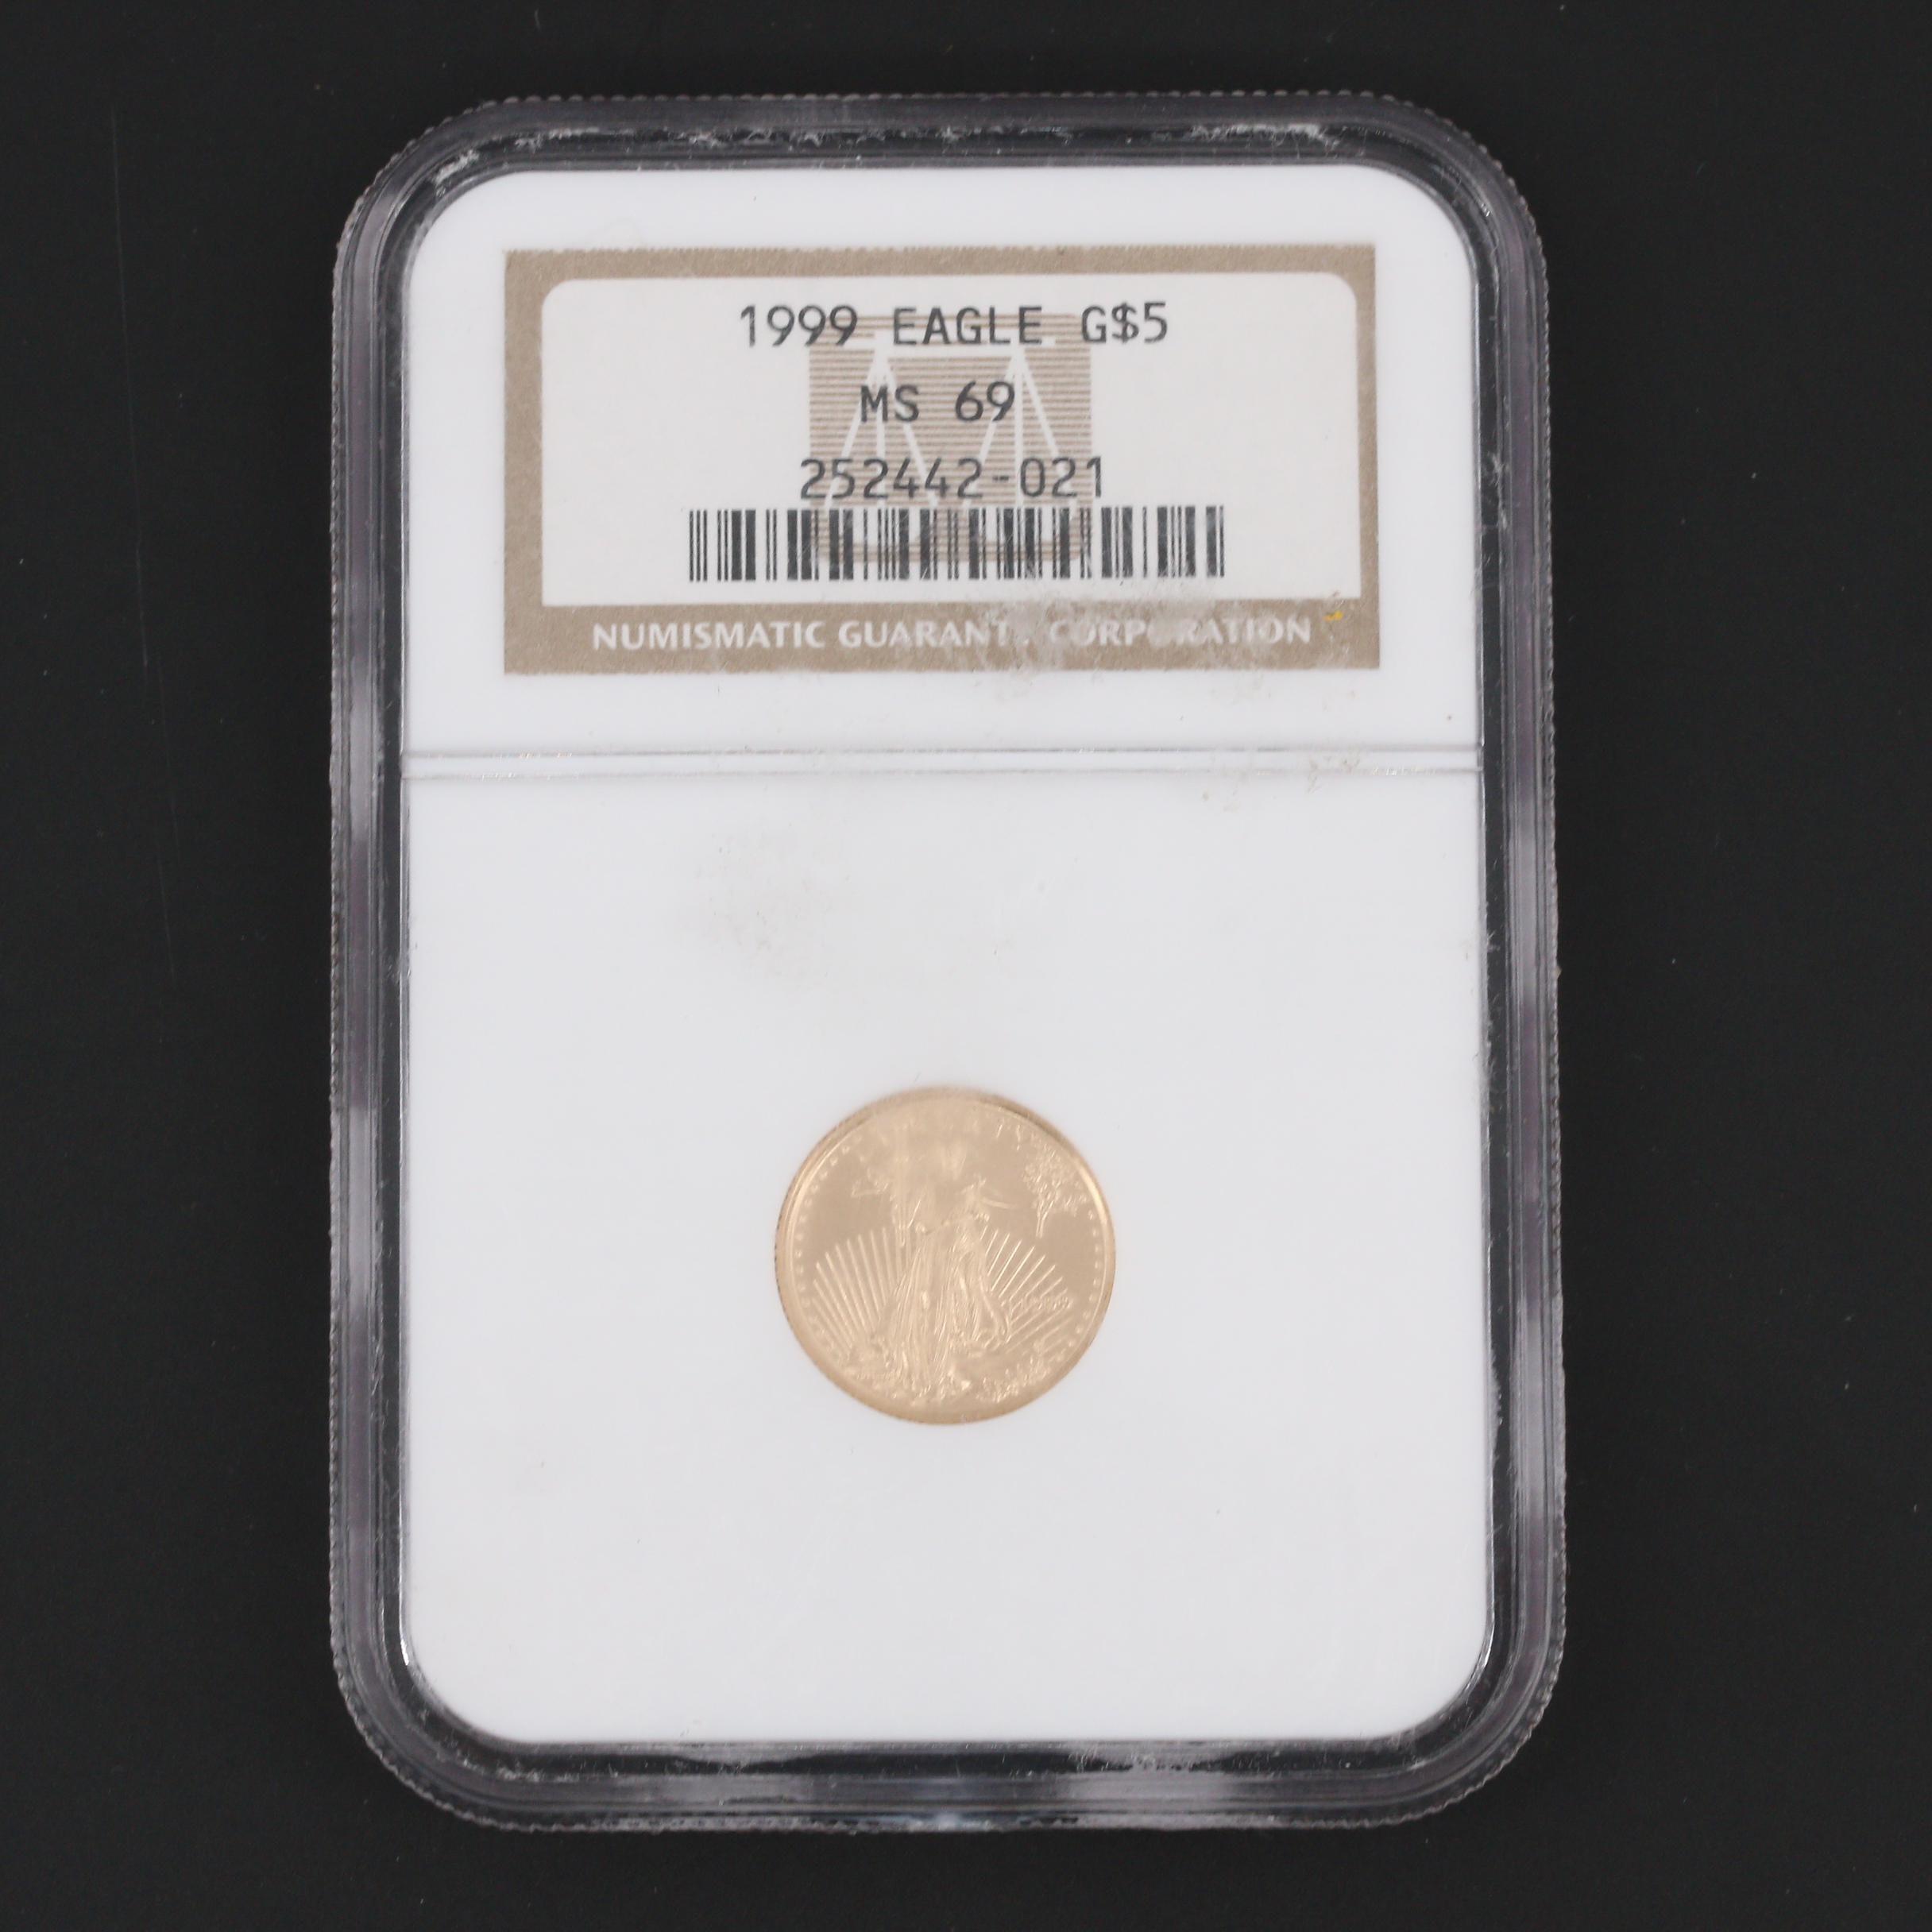 NGC Graded MS69 1999 $5 Gold Eagle 1/10 Oz. Bullion Coin